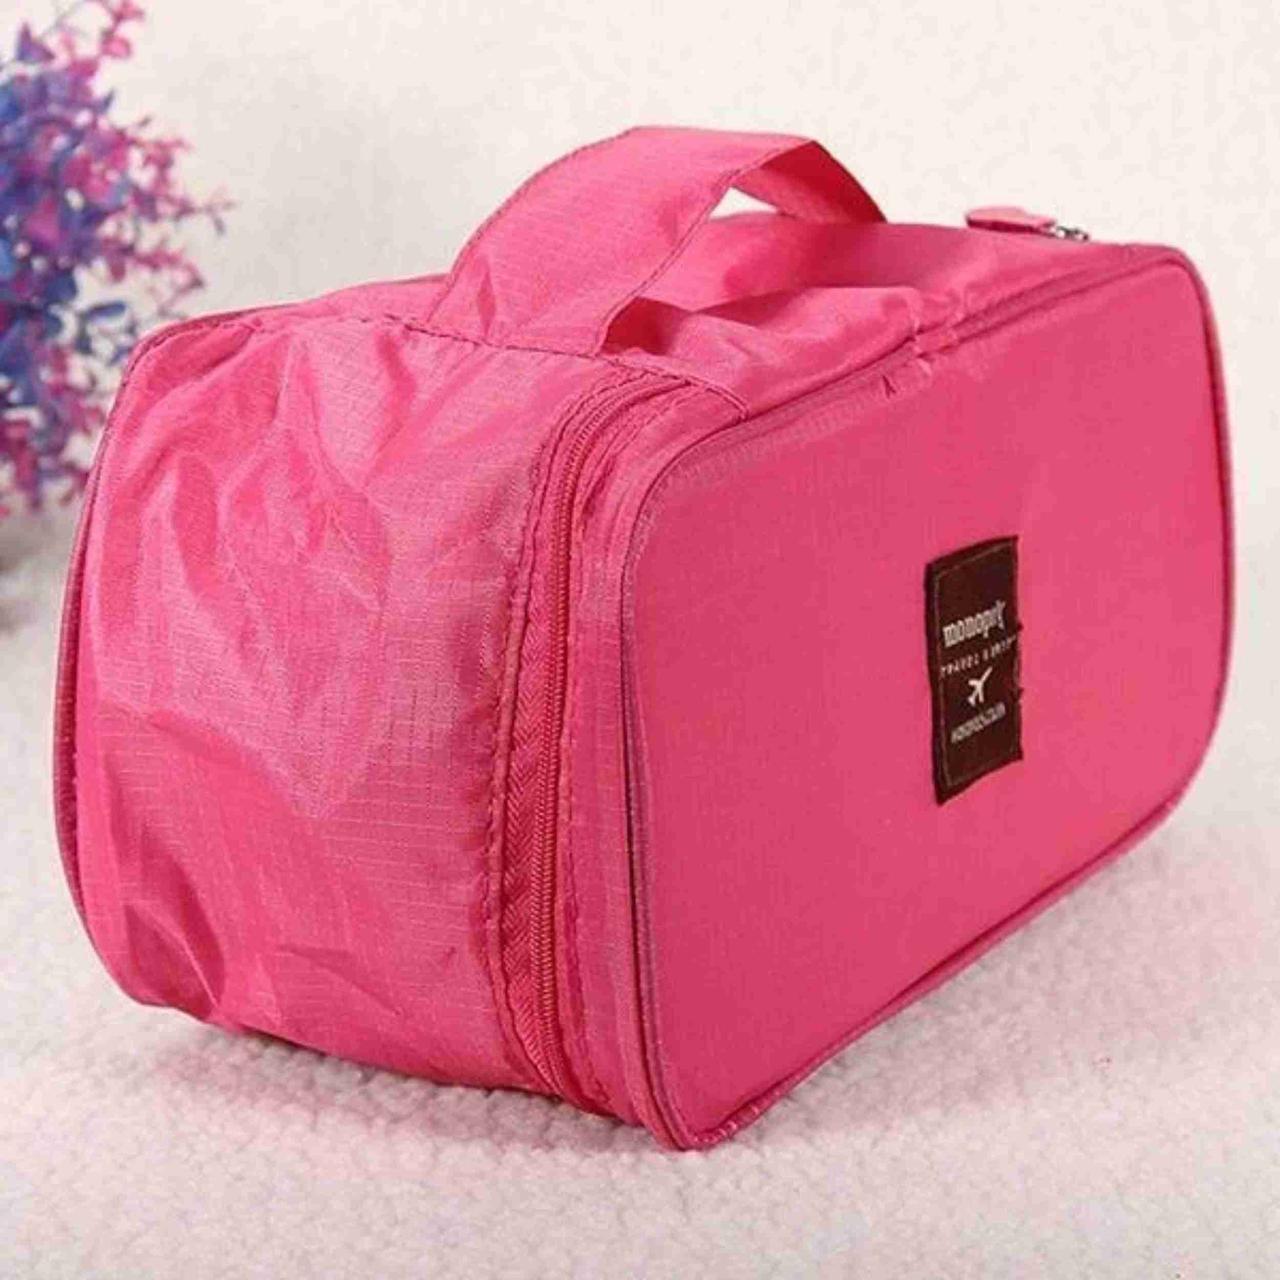 Органайзер для белья Monopoly Travel underwear pouch Розовый Боксы для хранения